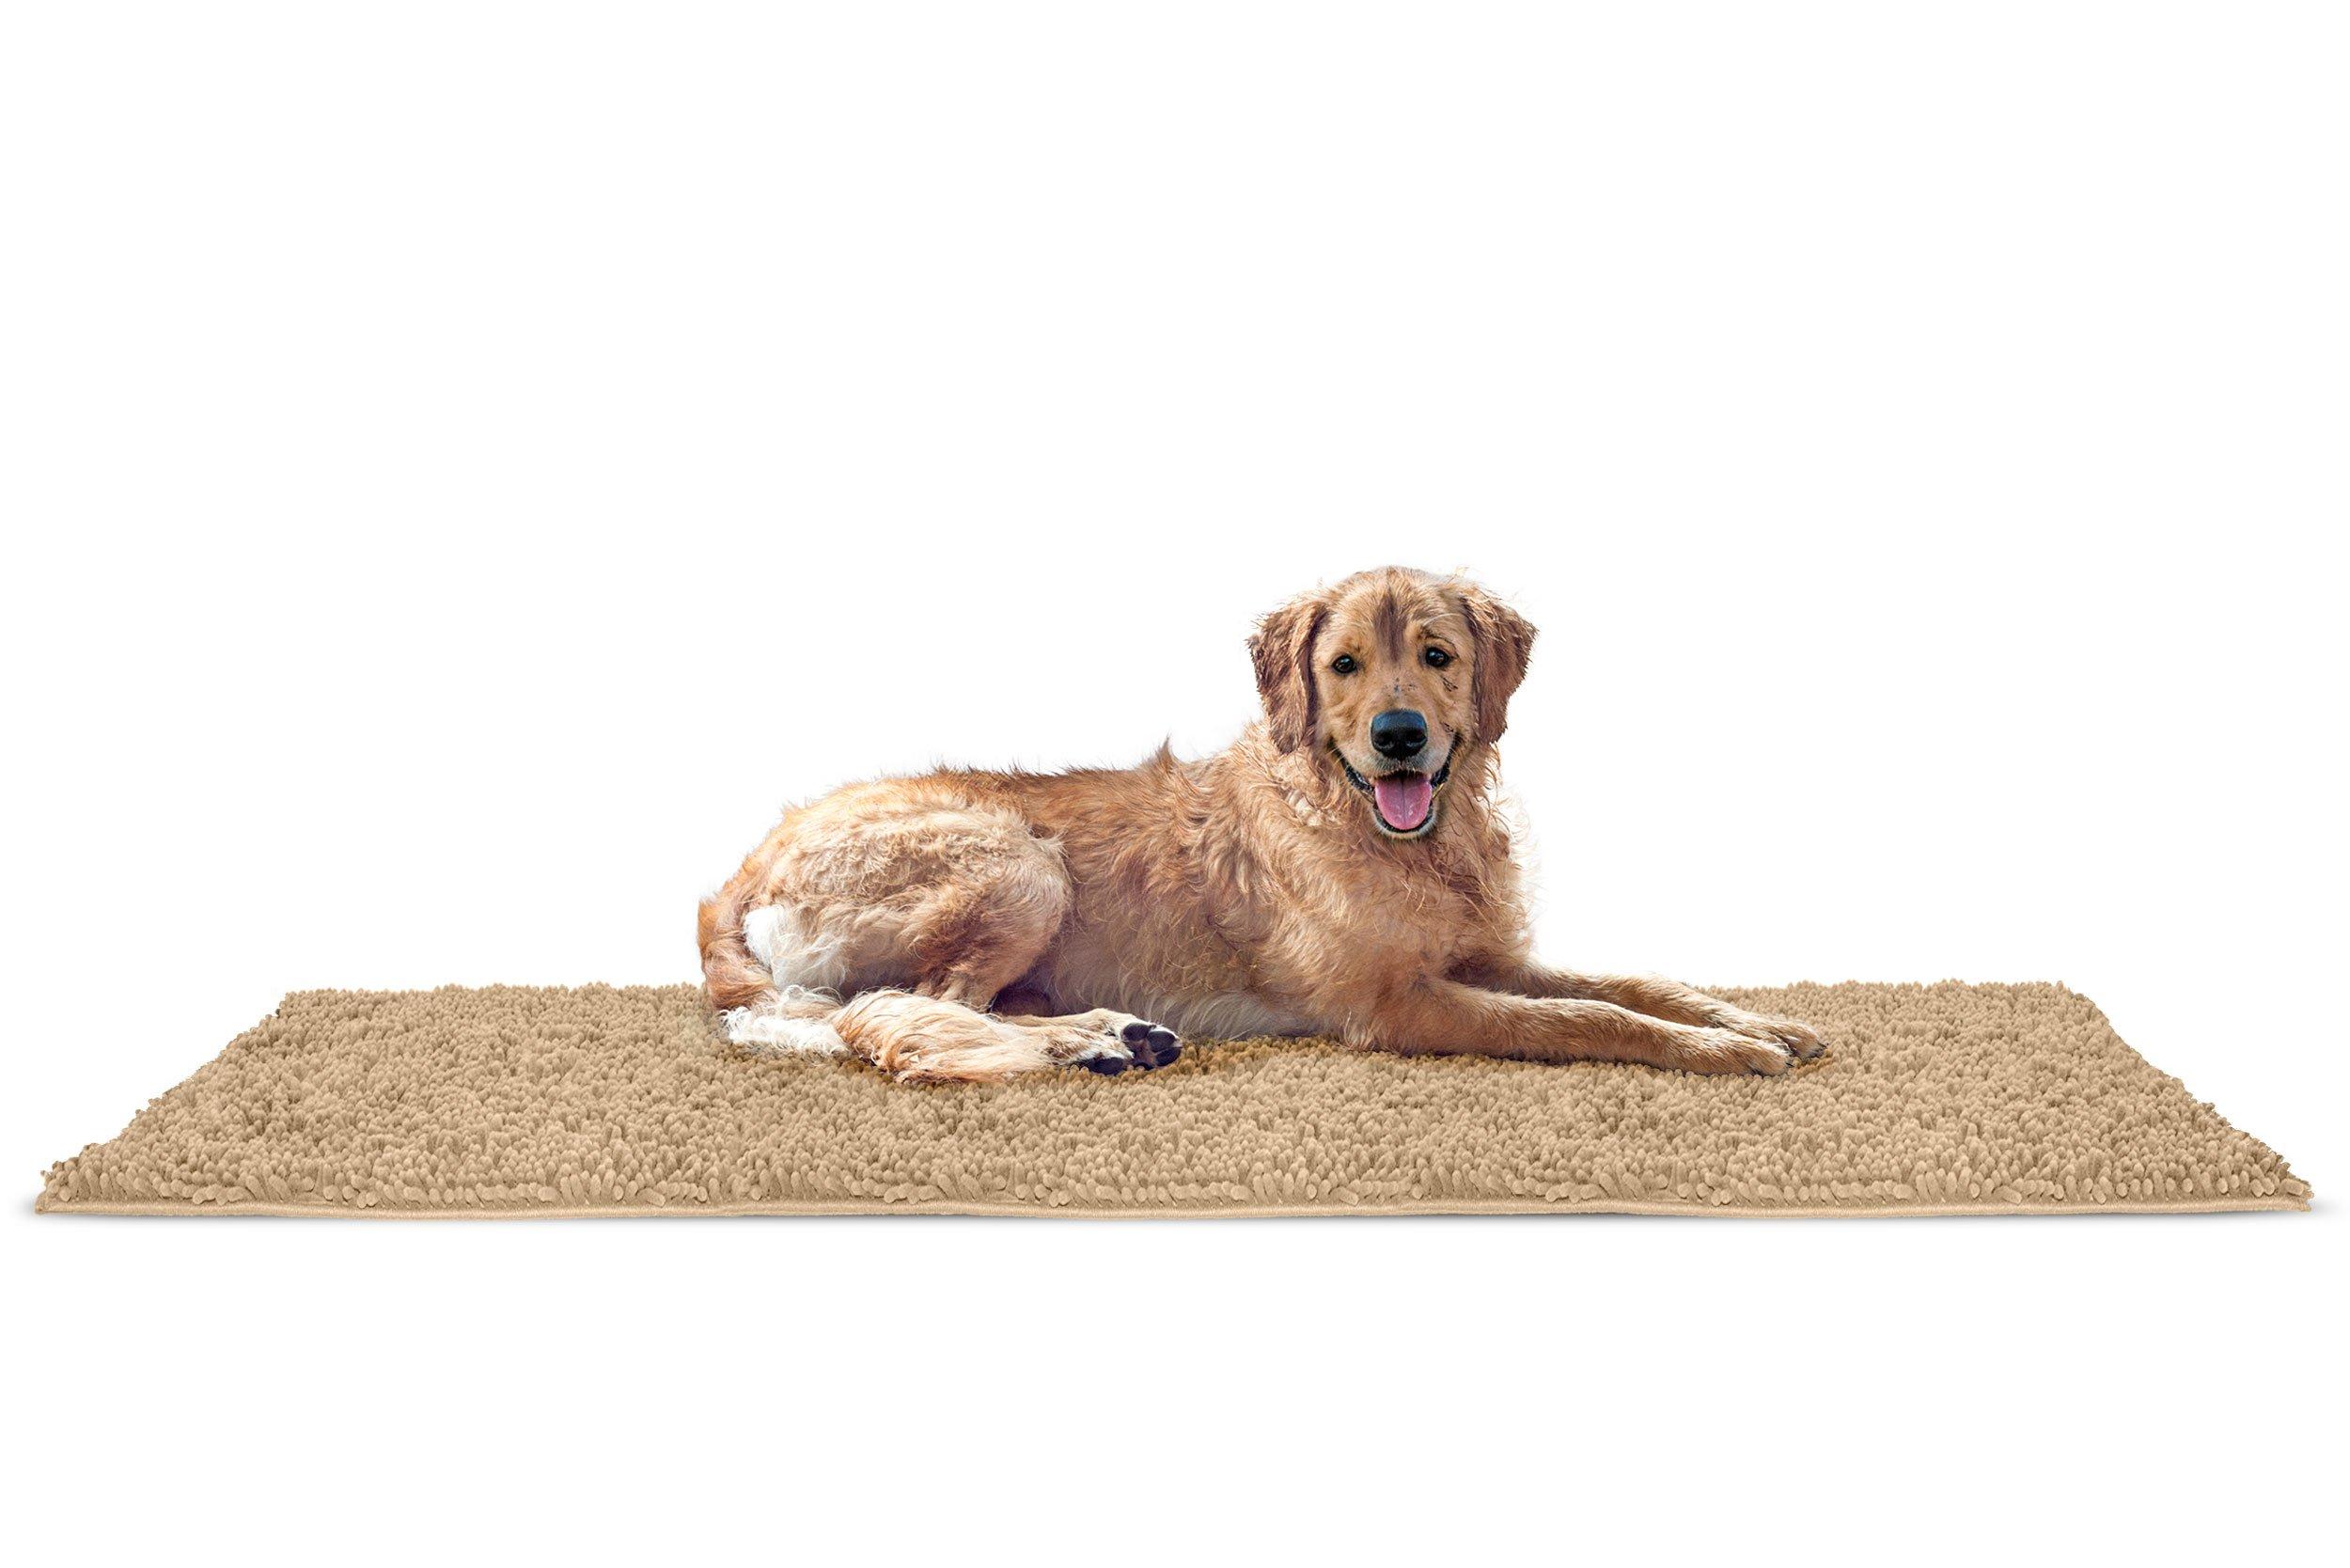 Furhaven Pet 80551613 Runner Muddy Paws Towel & Shammy Rug - Sand by Furhaven Pet (Image #1)